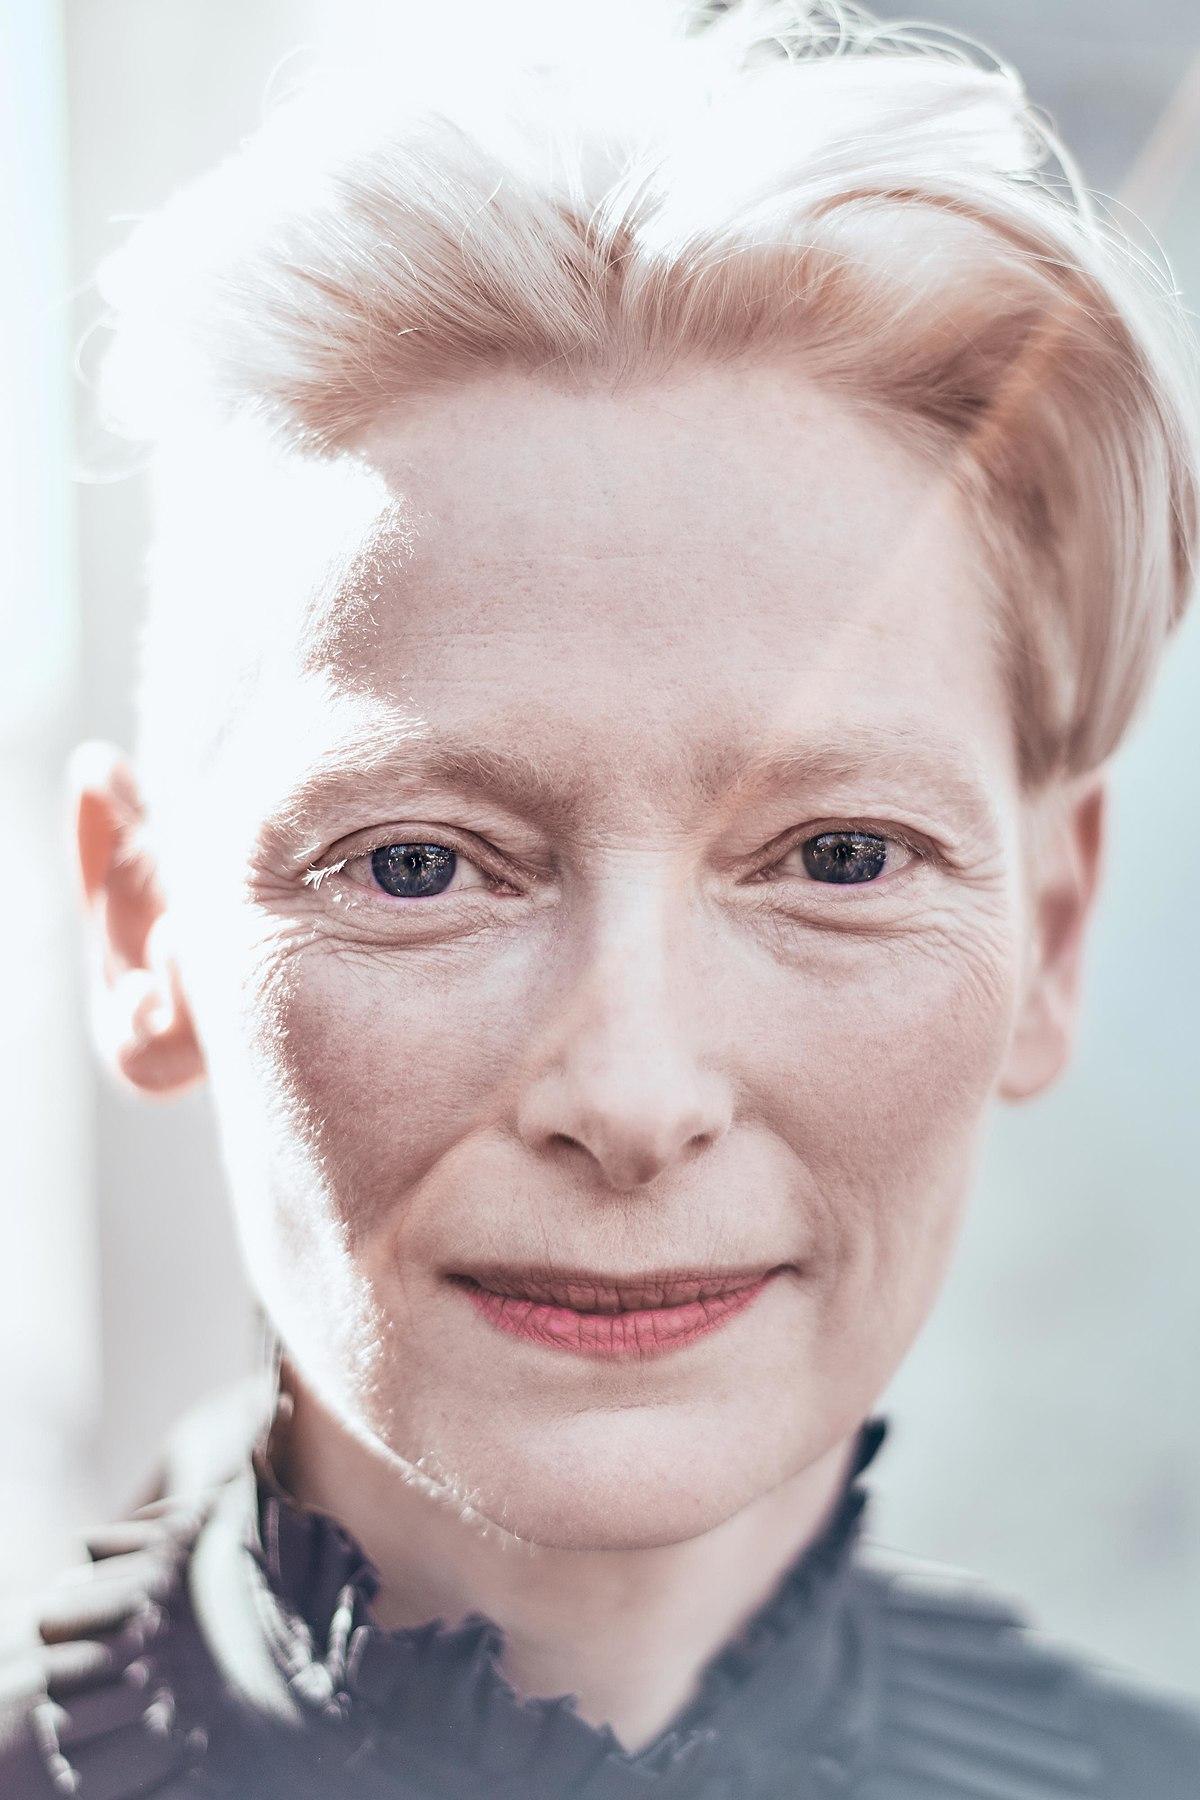 Tilda Swinton - Wikipedia